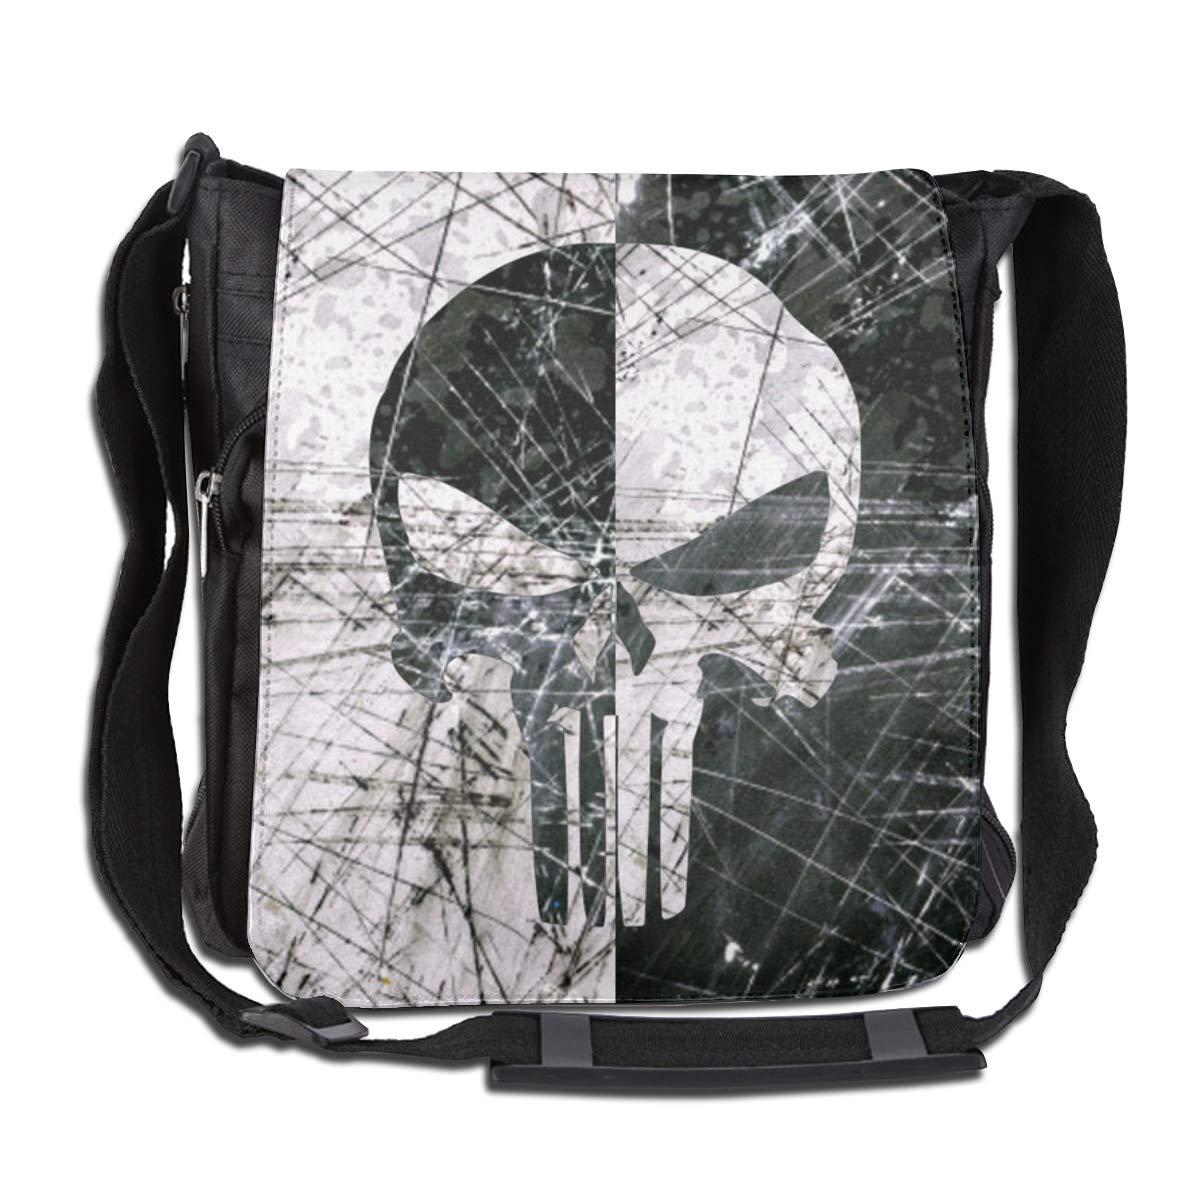 Unisex Pu-nis-her Printed Vertical Crossbody Single Shoulder Bag With Mini Adjustable Strap Travelling Bag